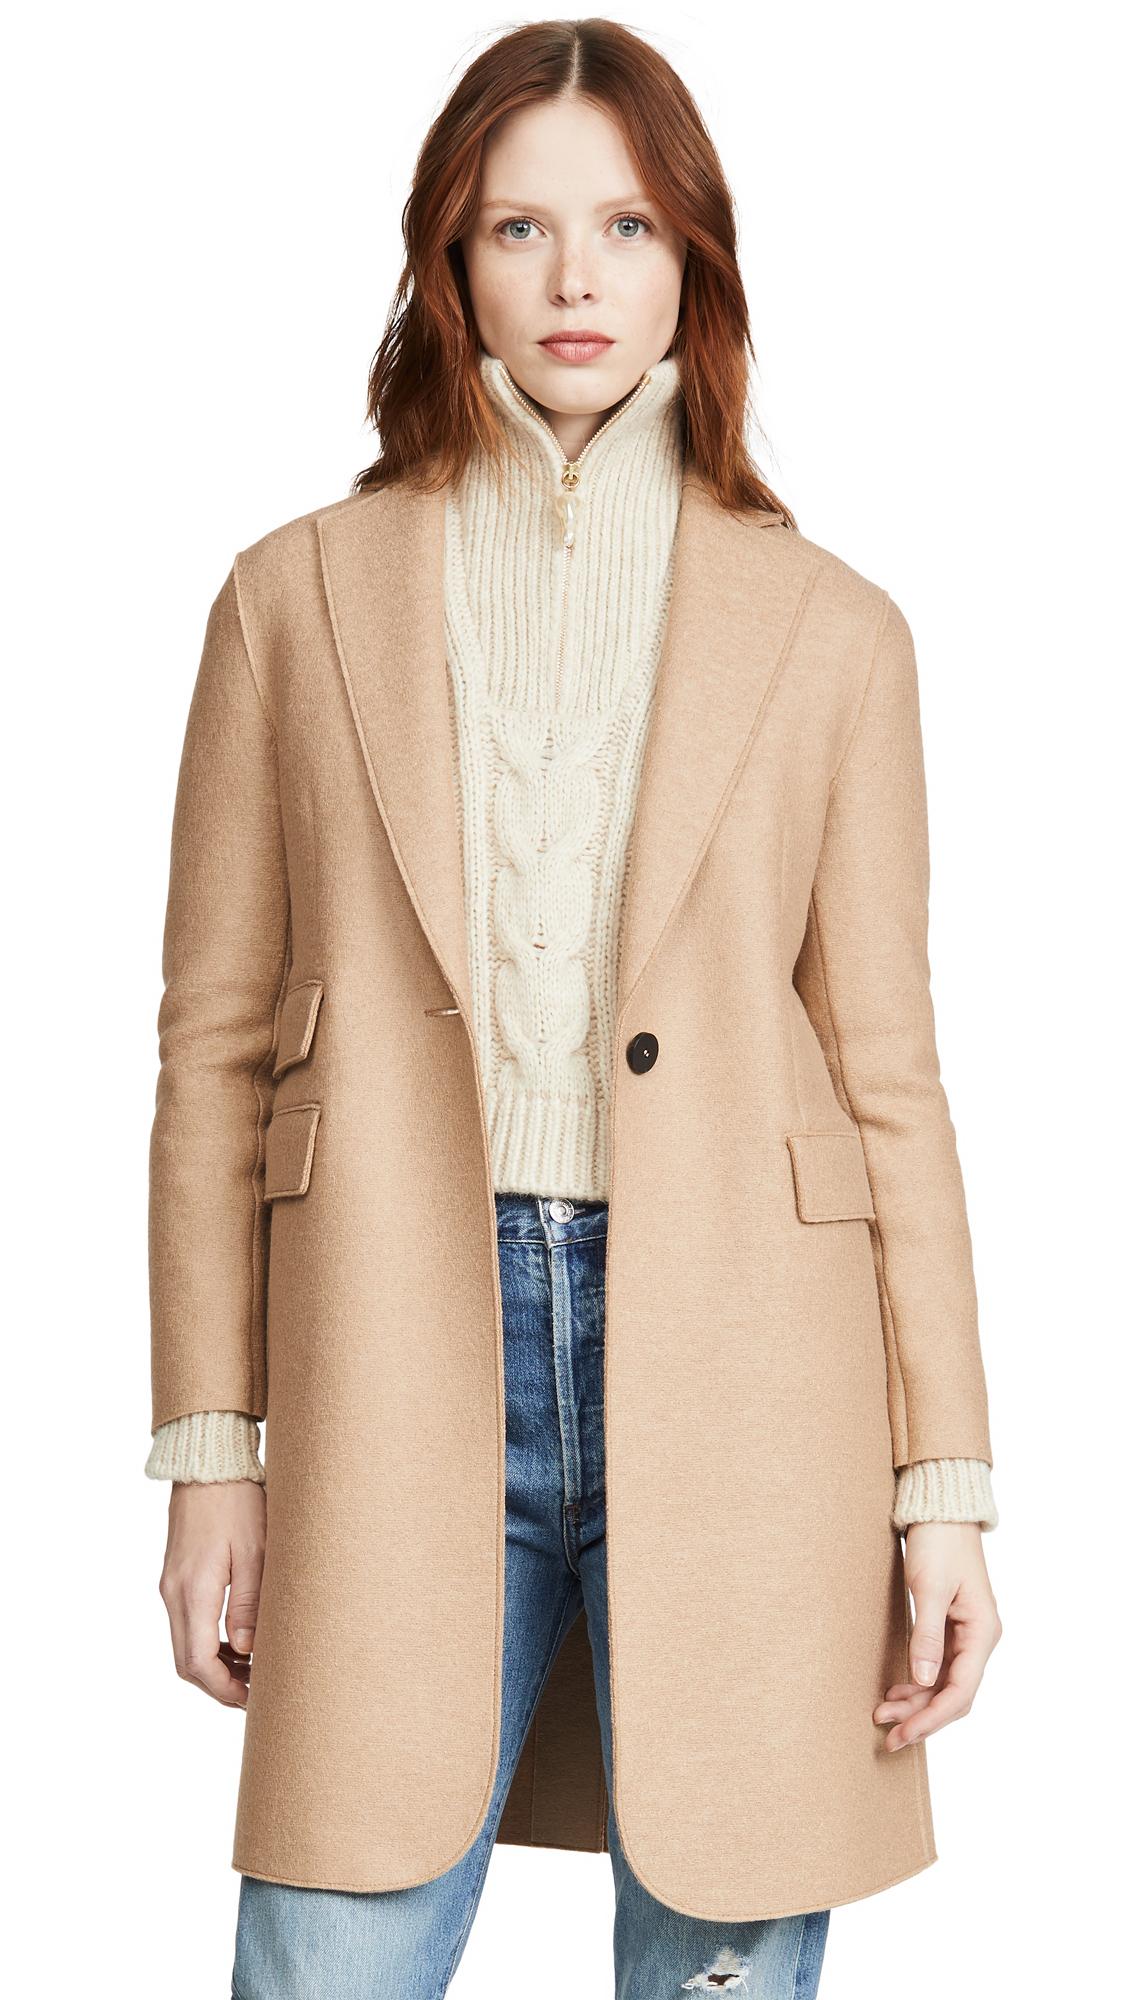 Buy Harris Wharf London Single Breasted Coat online beautiful Harris Wharf London Clothing, Jackets